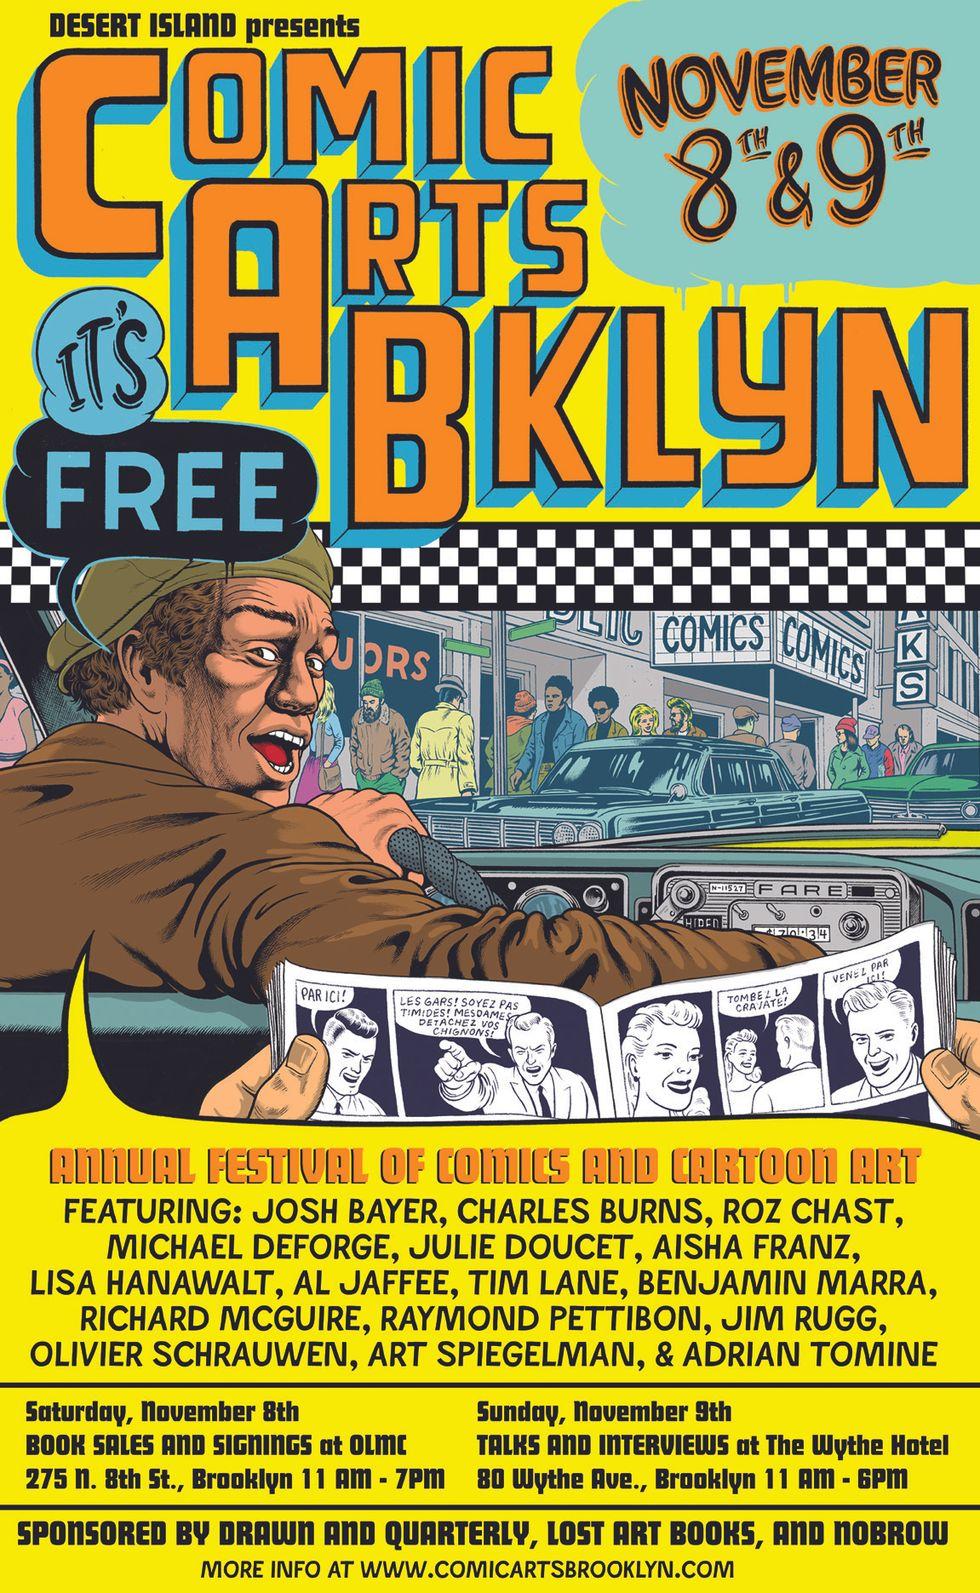 Comic Arts Brooklyn Kicks Off This Weekend With Talks by Raymond Pettibon, Adrian Tomine + More